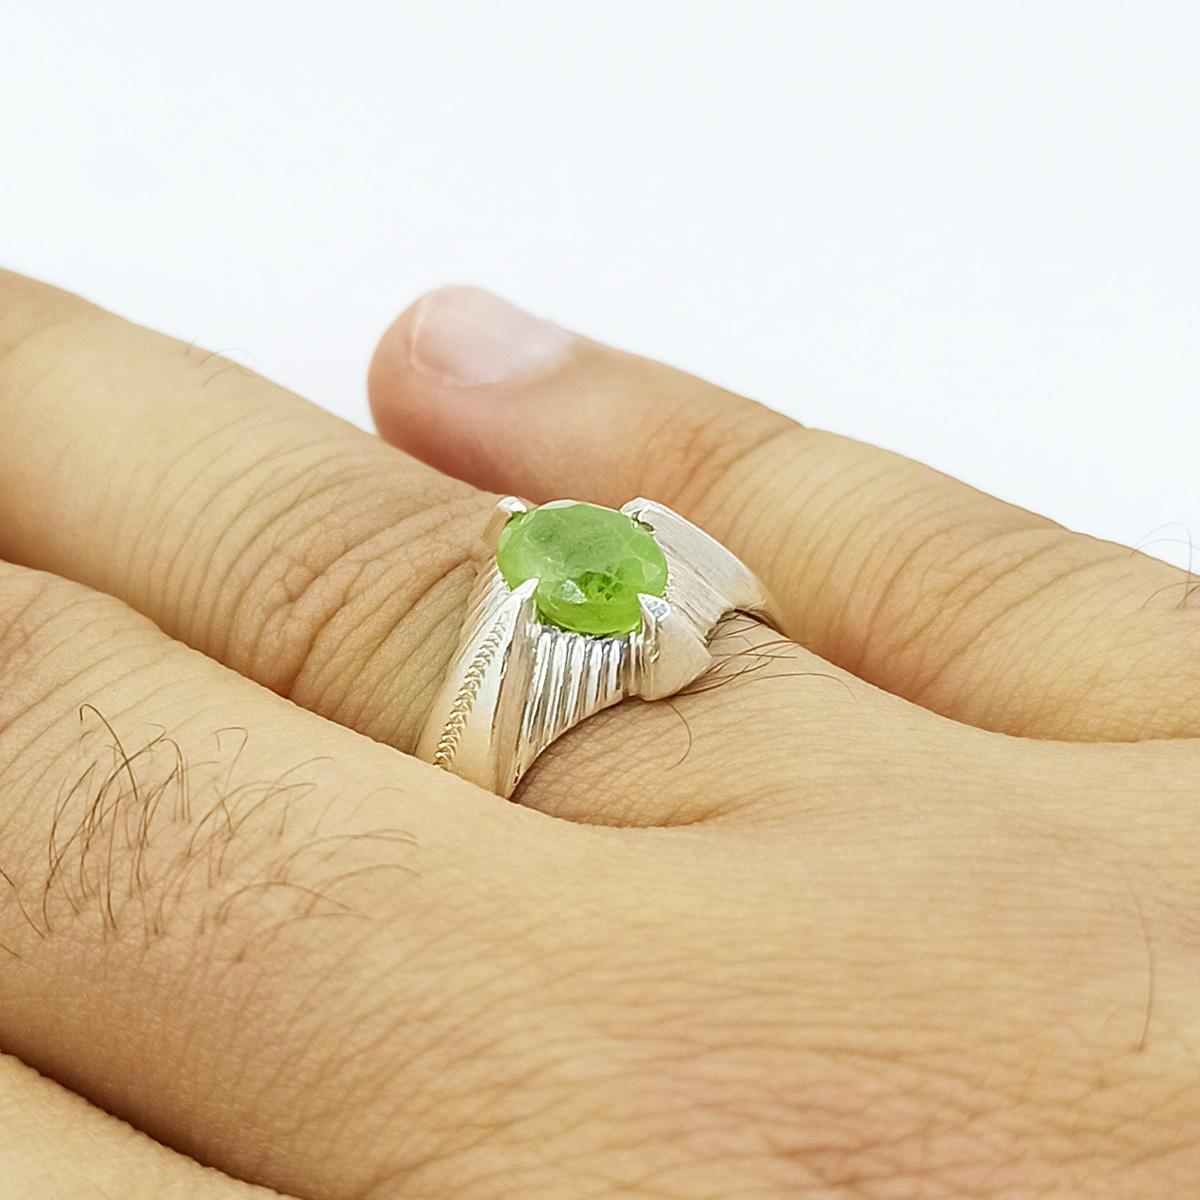 انگشتر نقره مردانه سلین کالا مدل زبرجد ce-As180